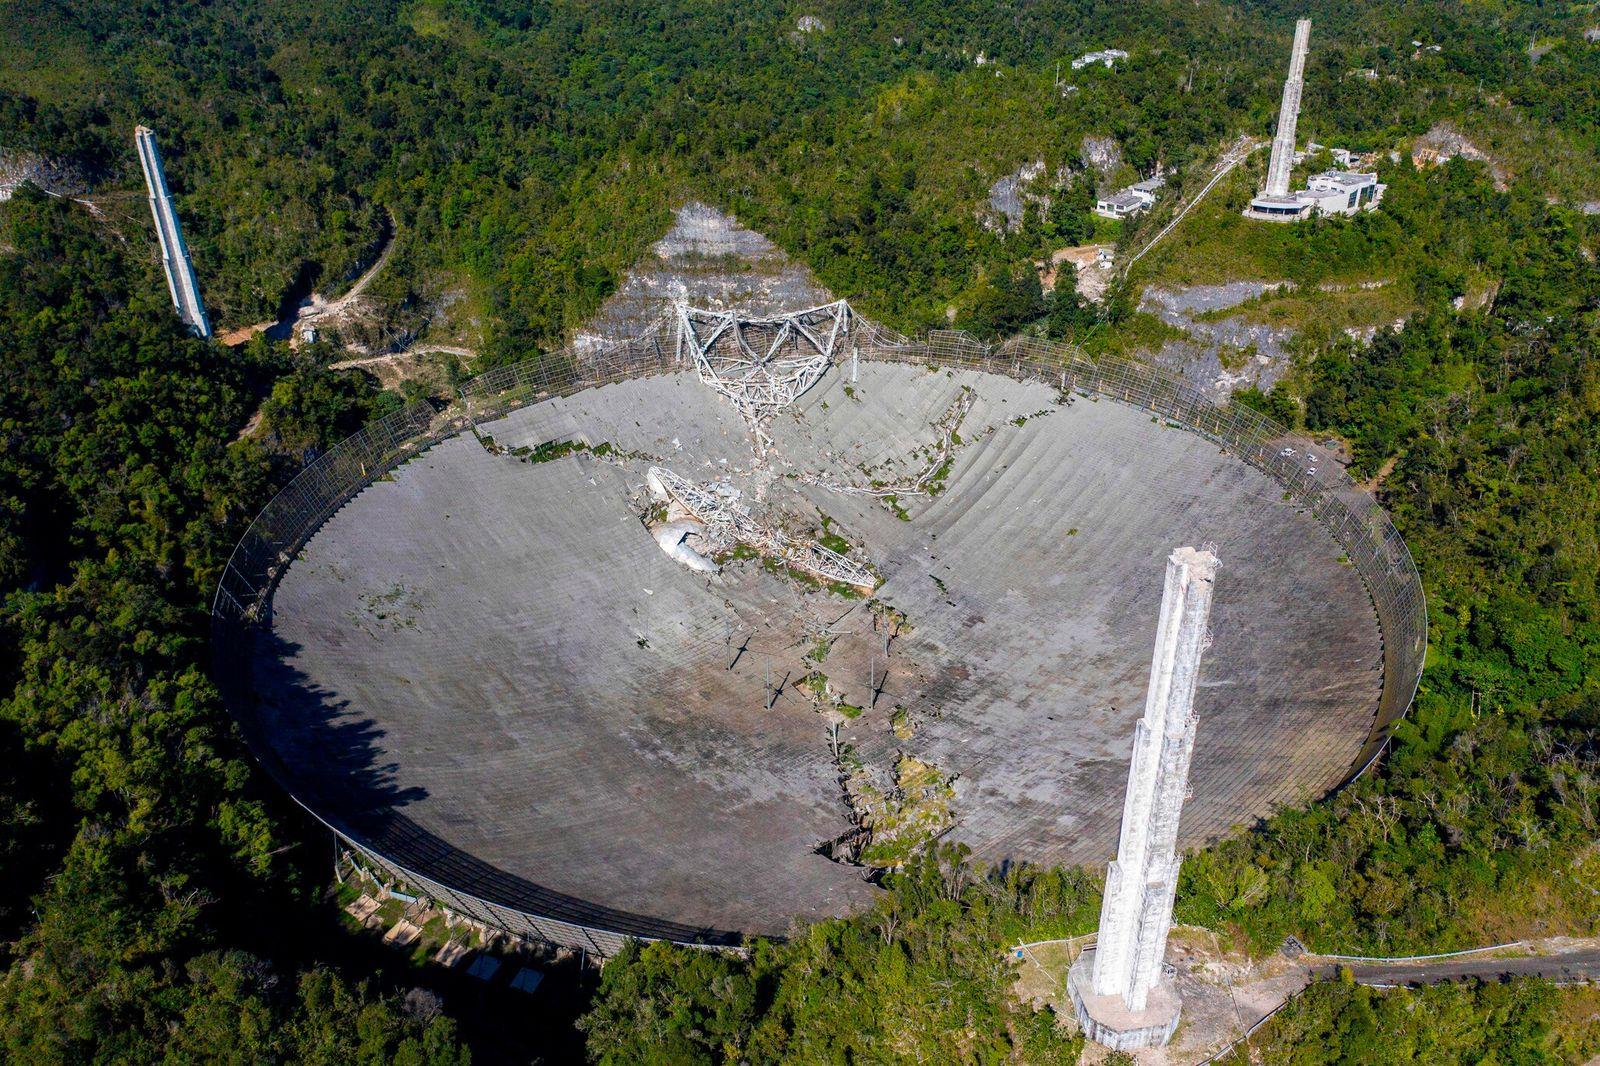 Puerto Rico: Berühmtes Radioteleskop ist eingestürzt